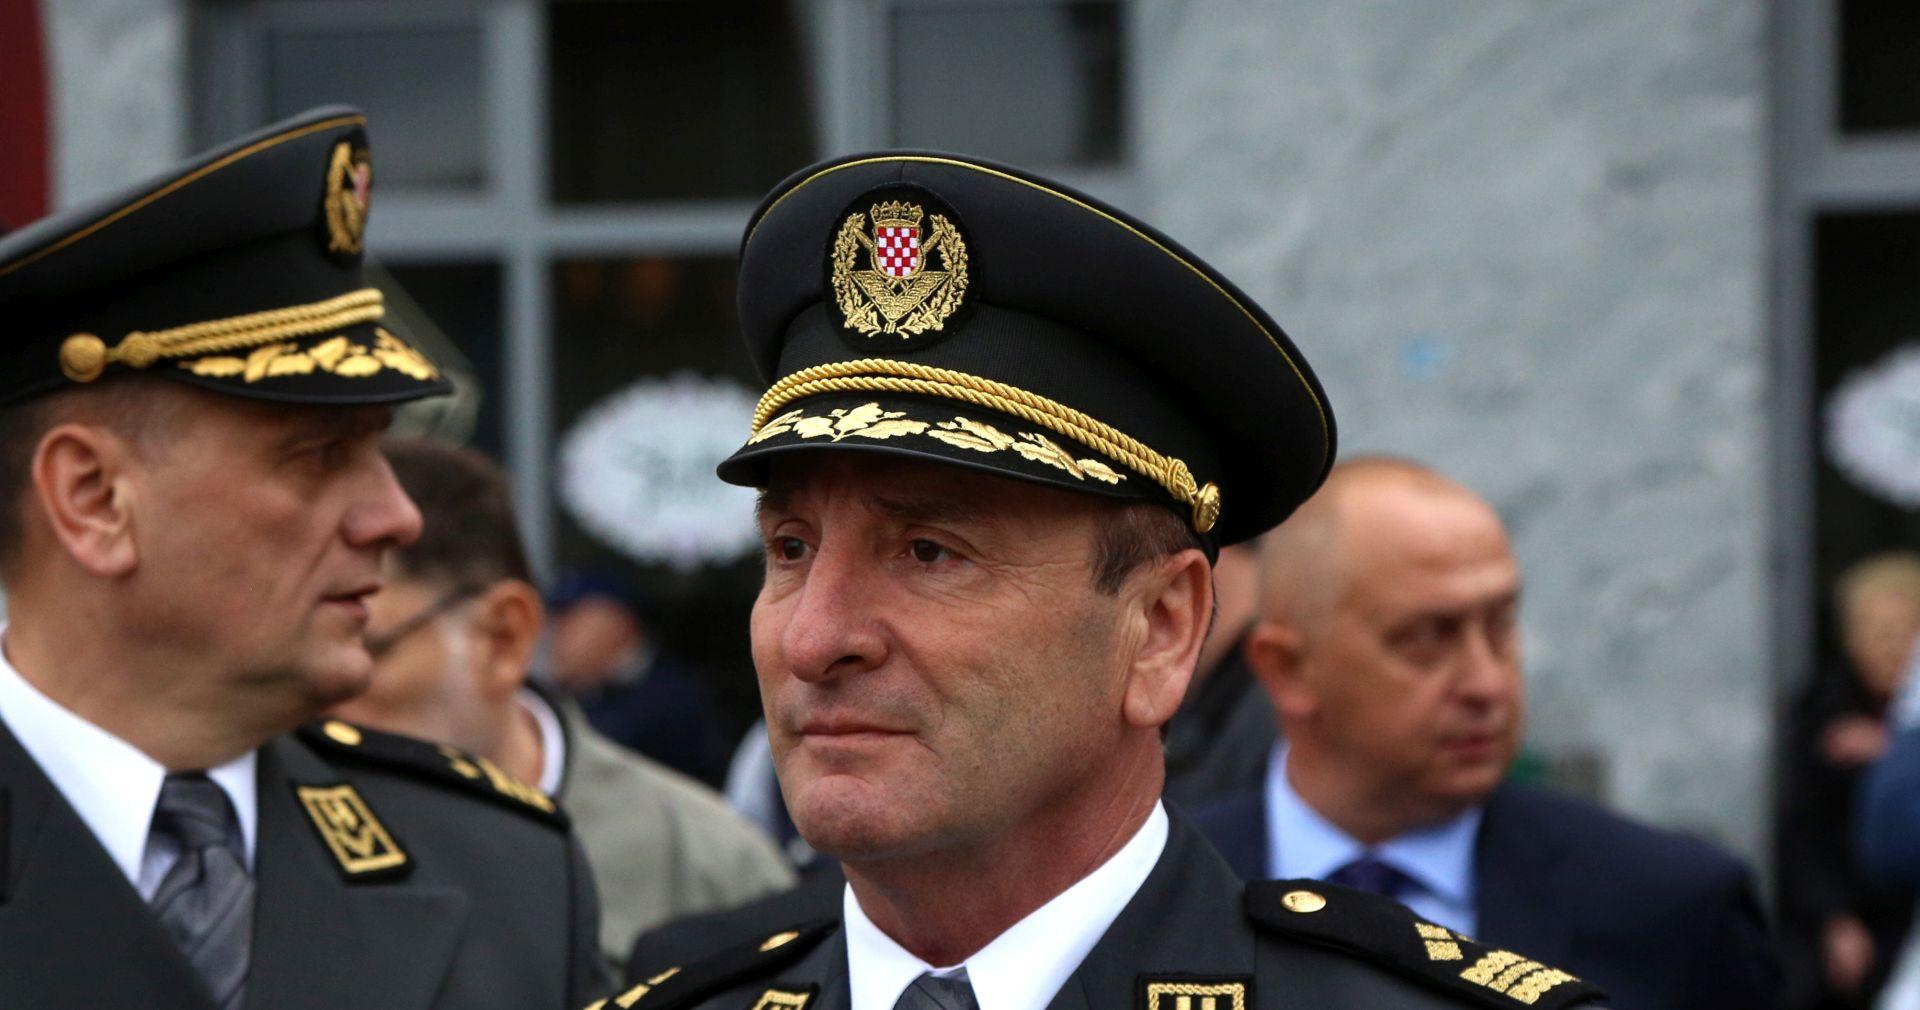 RAZORUŽAVANJE VOJNIKA NA BLEIBURGU General Šundov: Dogodila se mala neugodnost